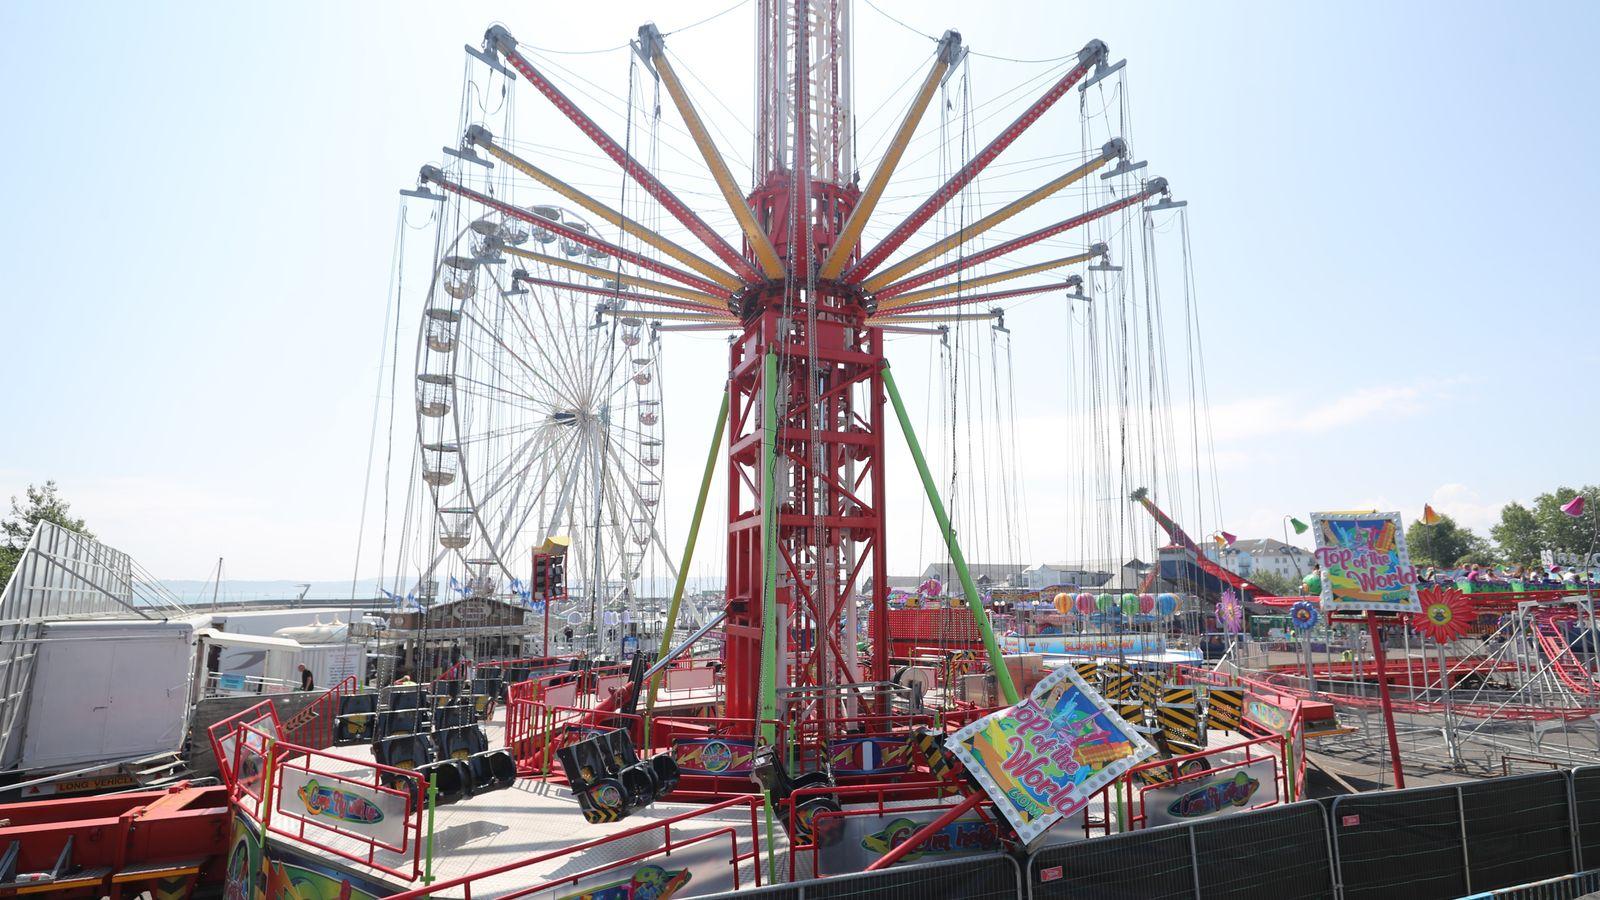 Planet Fun: Injuries on funfair ride caused by teenagers misbehaving, owners claim